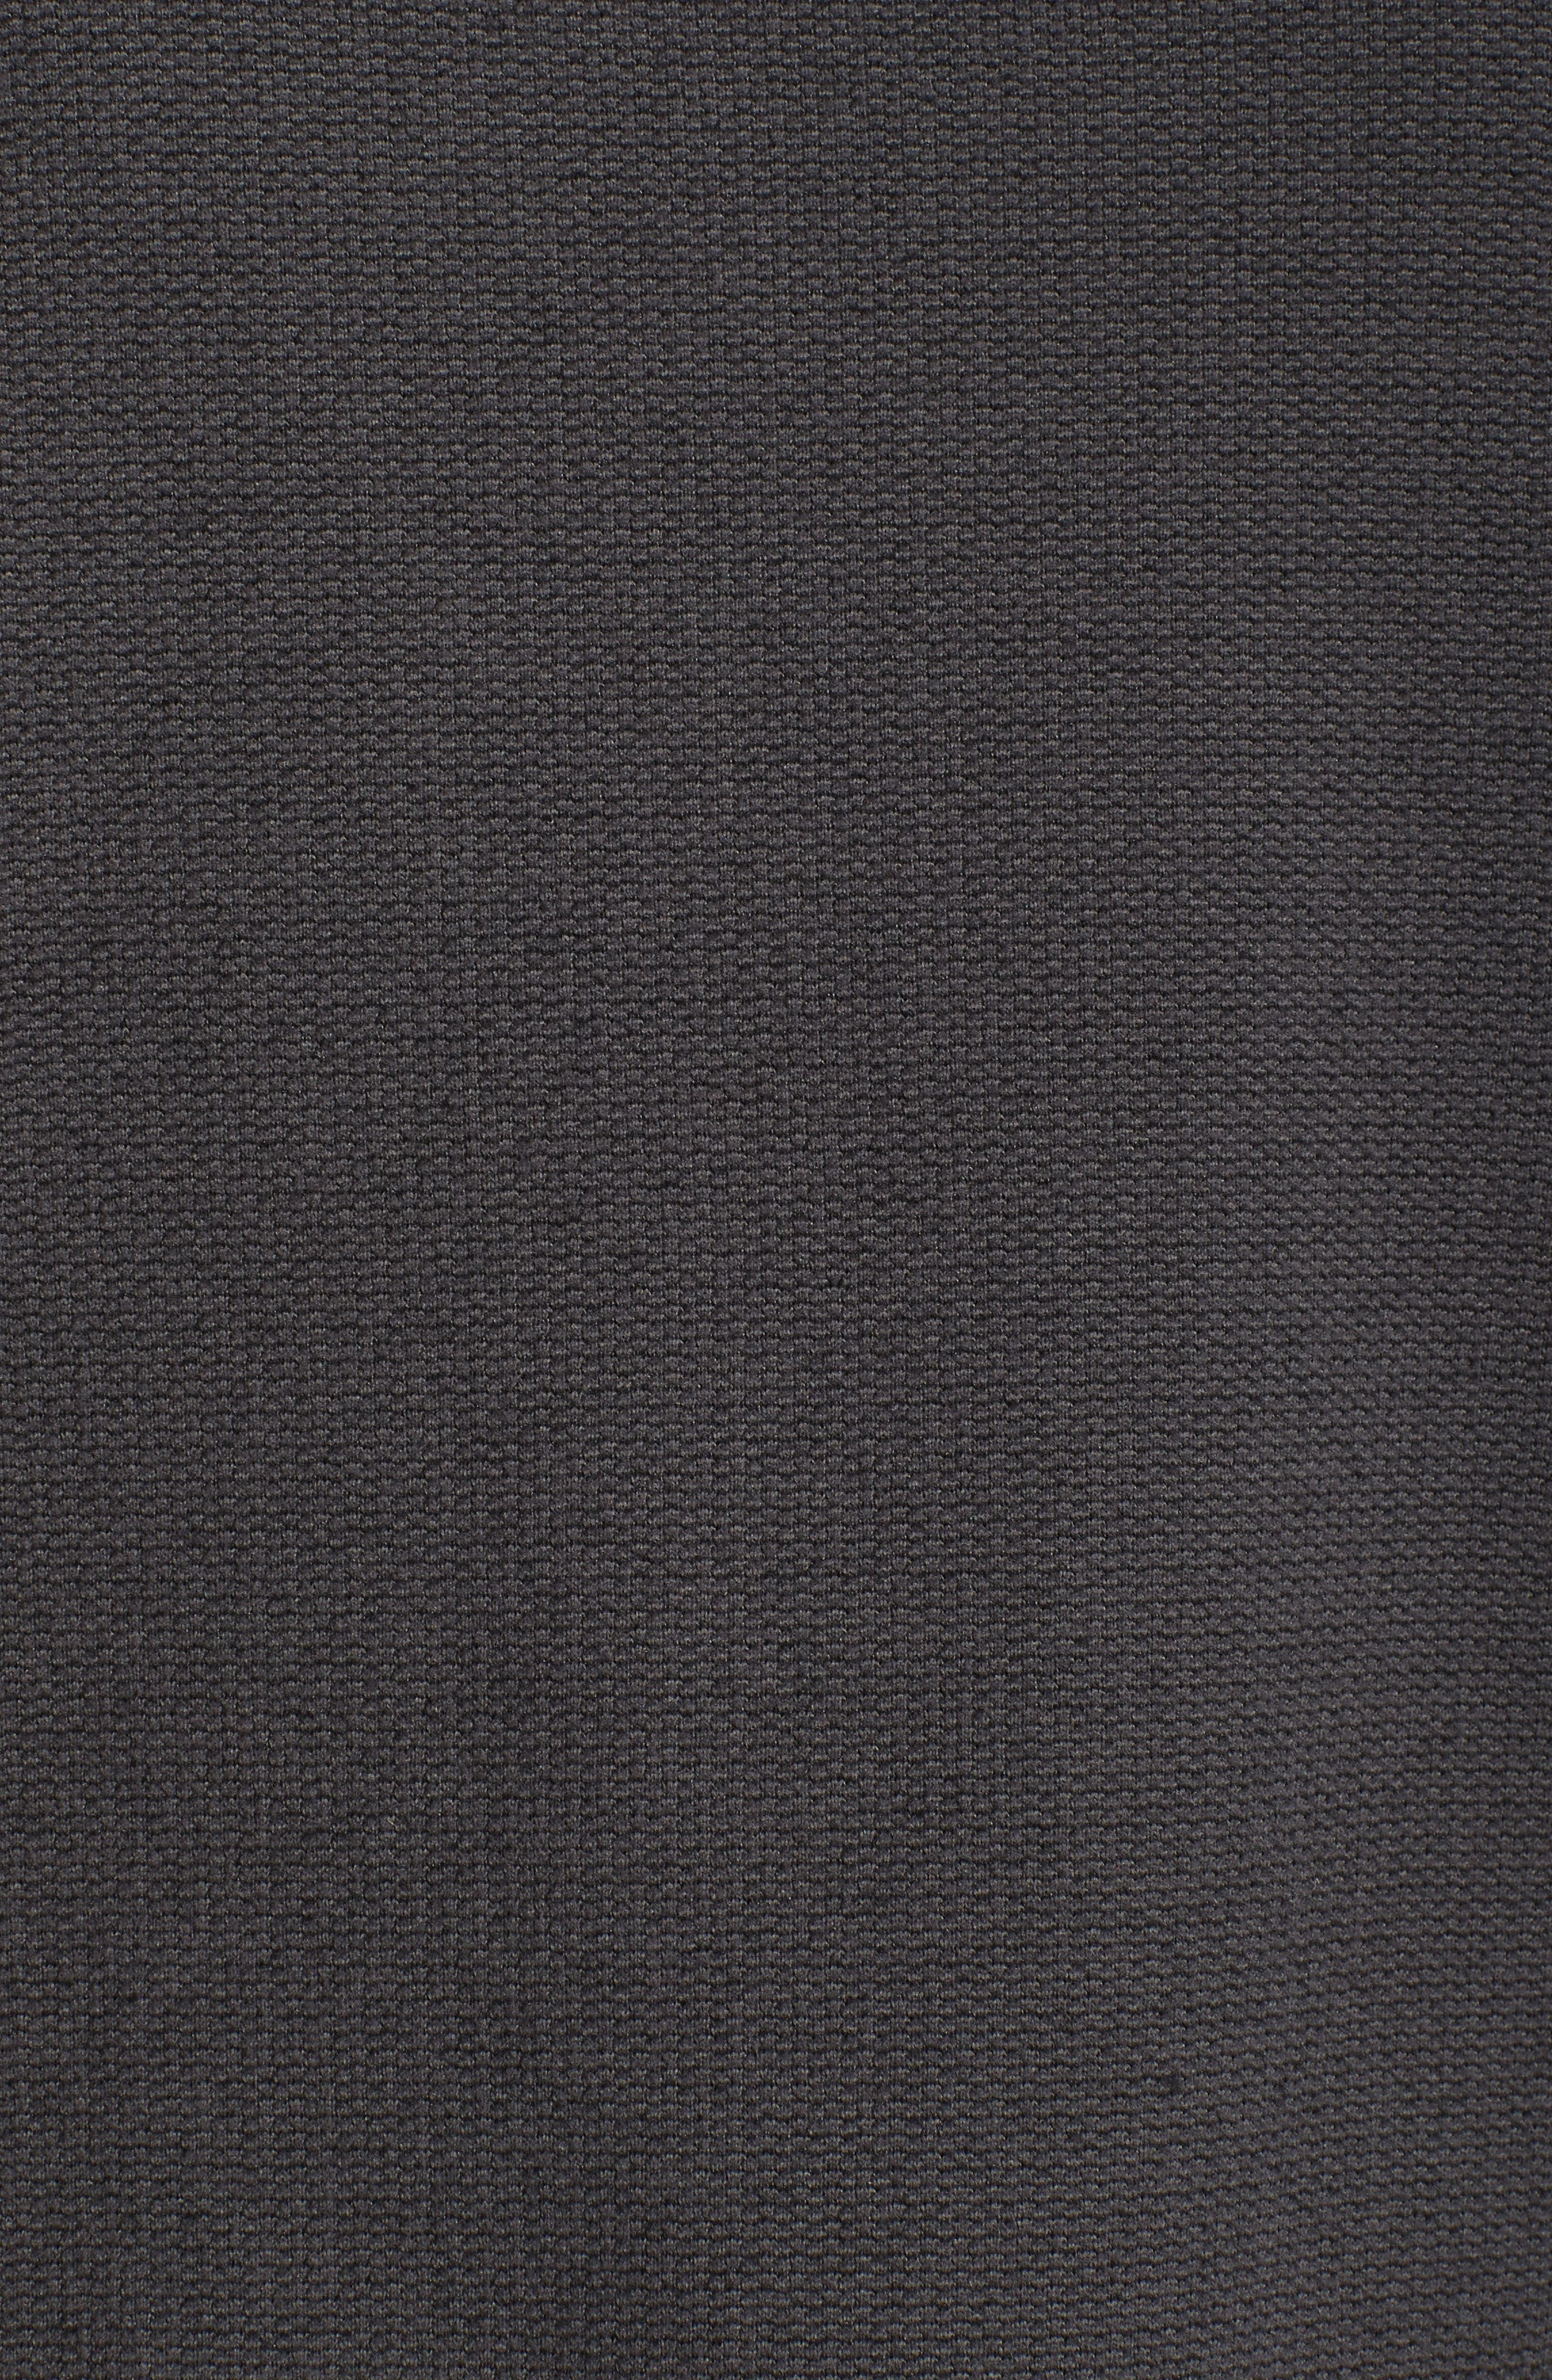 Knit Stitch Fleece Hoodie,                             Alternate thumbnail 6, color,                             Tnf Black